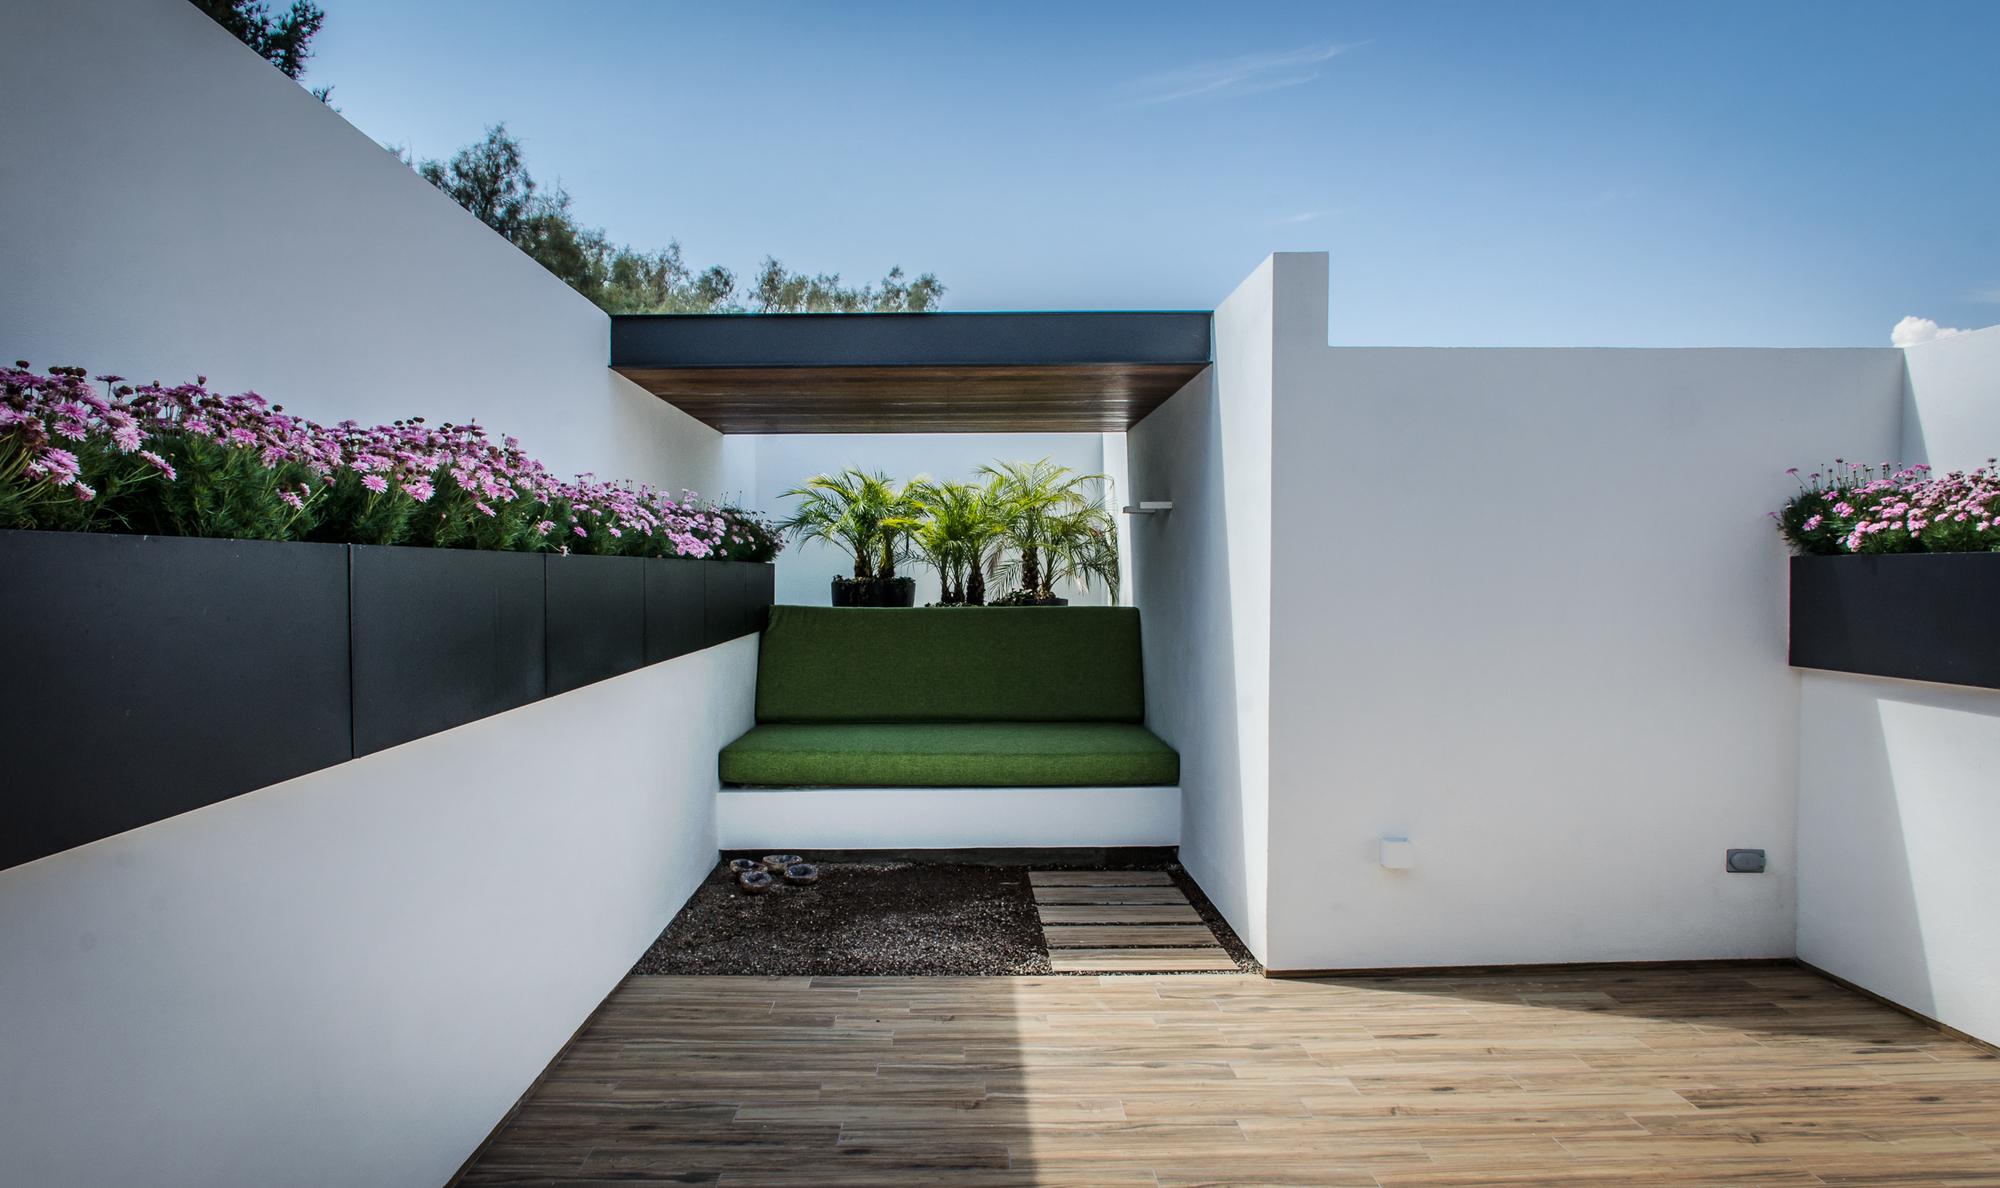 Galer a de casa agr adi arquitectura y dise o interior 3 for Arquitectura y diseno de casas